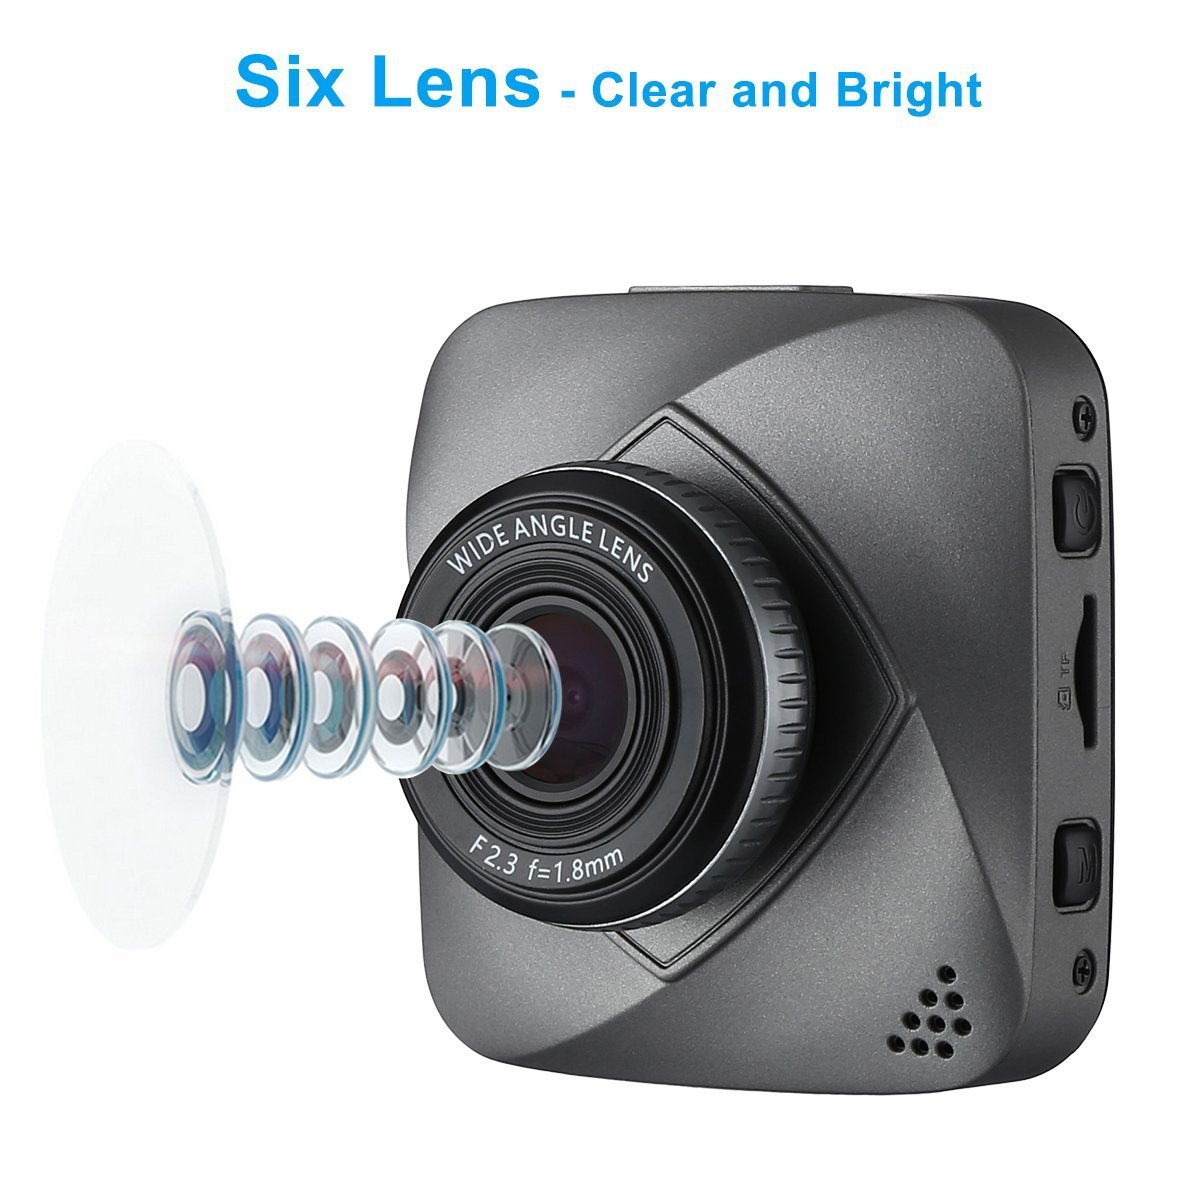 isYoung Dash Cam Full HD 720P Car Vedio Recorder Car Dashboard Camera Night Vision with Loop Recording, 120 Degree